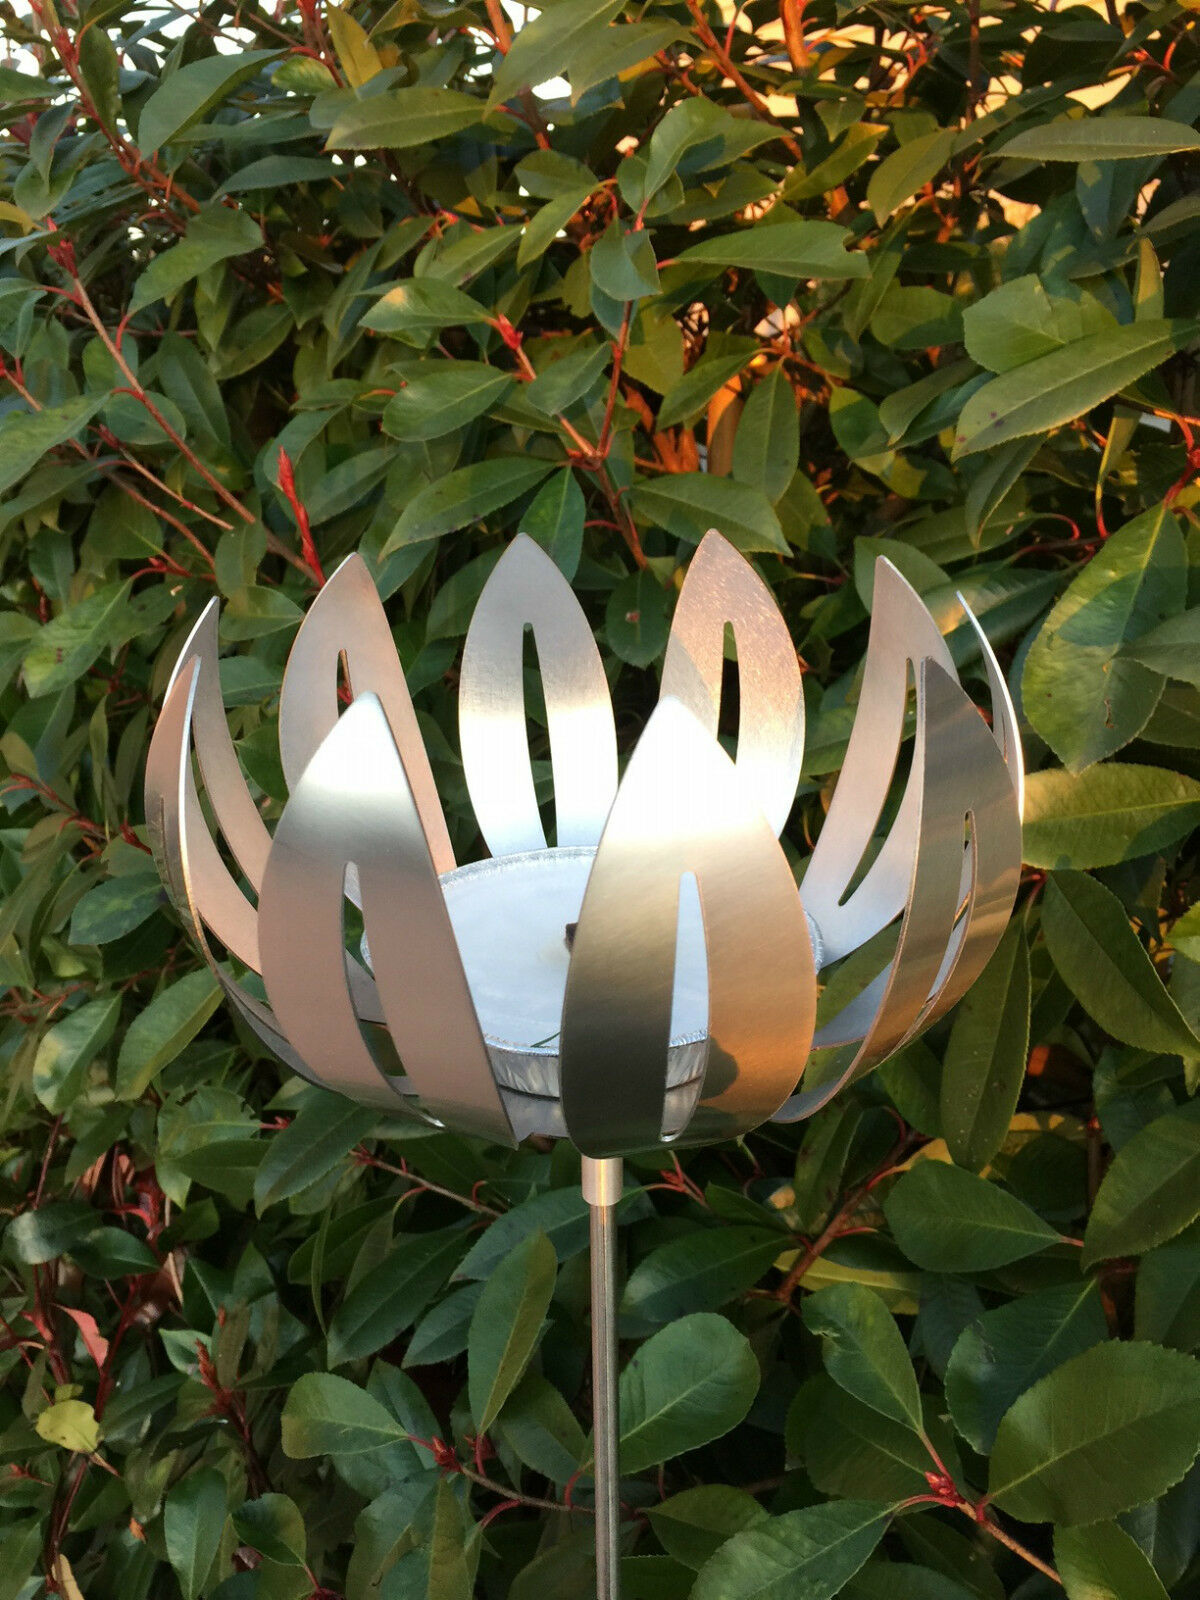 Edelstahlstele  flor  jardín vela enchufe para jardín edelstahlfackel gartendeko Top